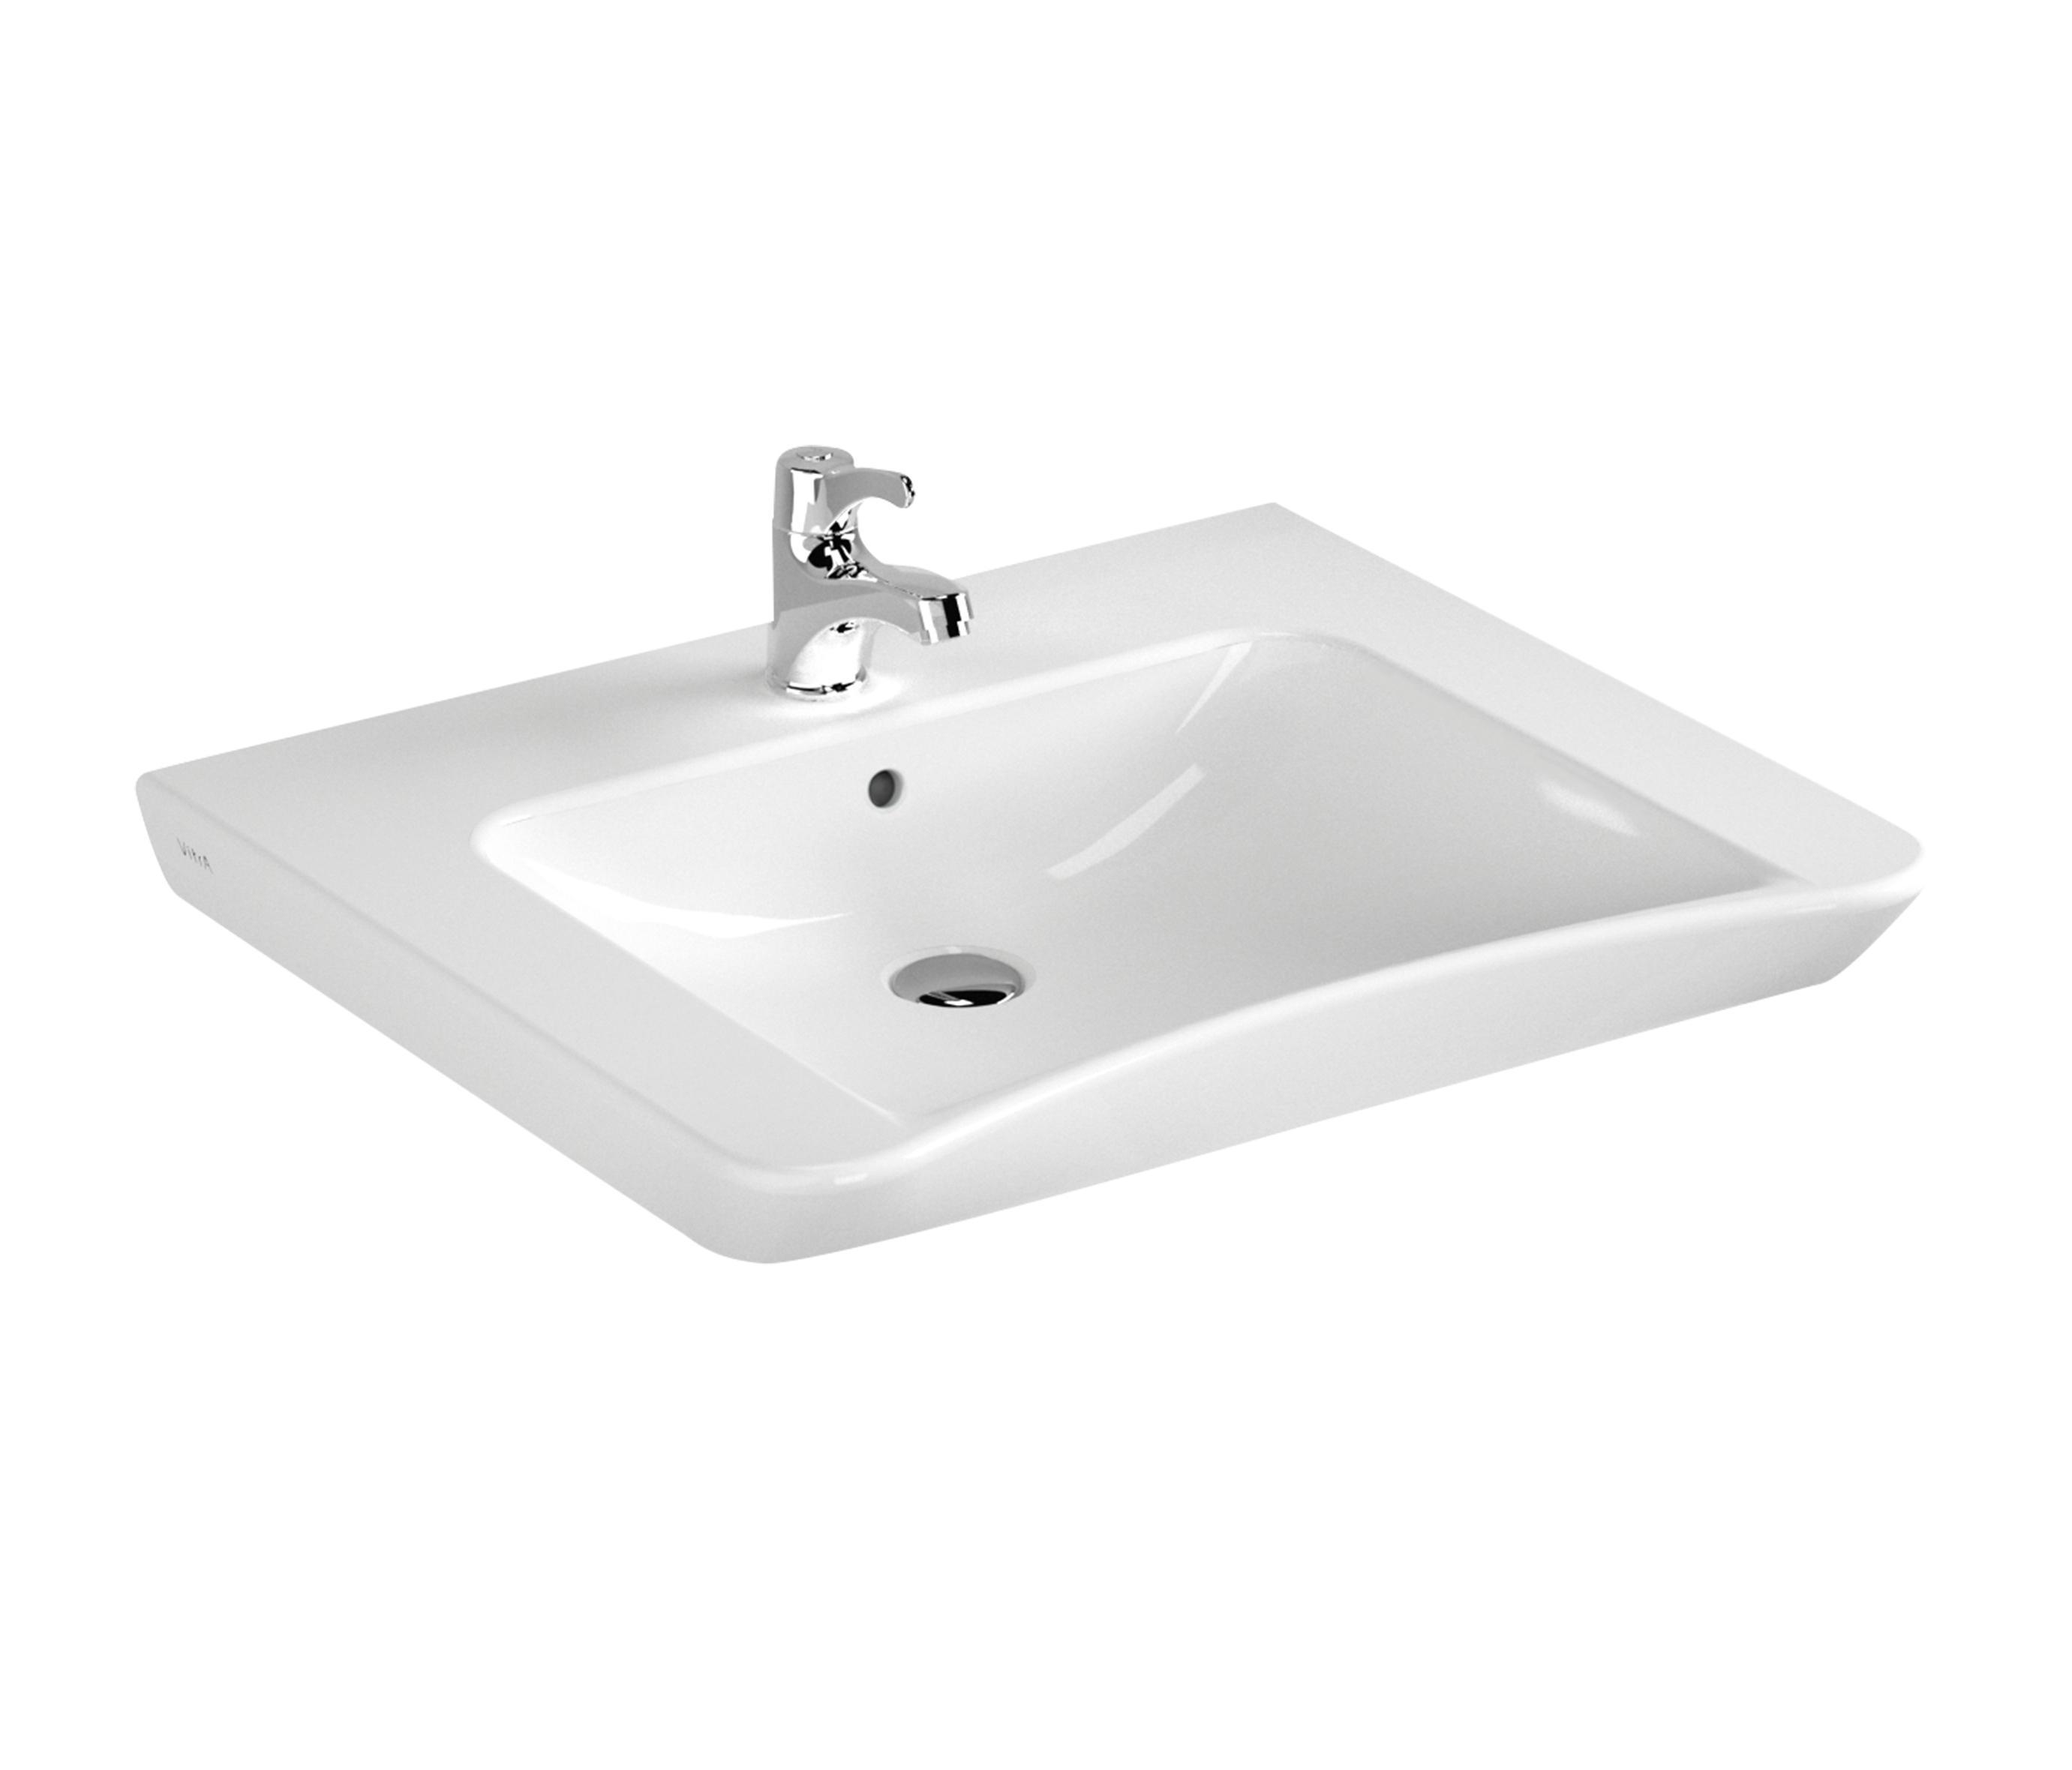 conforma washbasin wash basins from vitra bad architonic. Black Bedroom Furniture Sets. Home Design Ideas